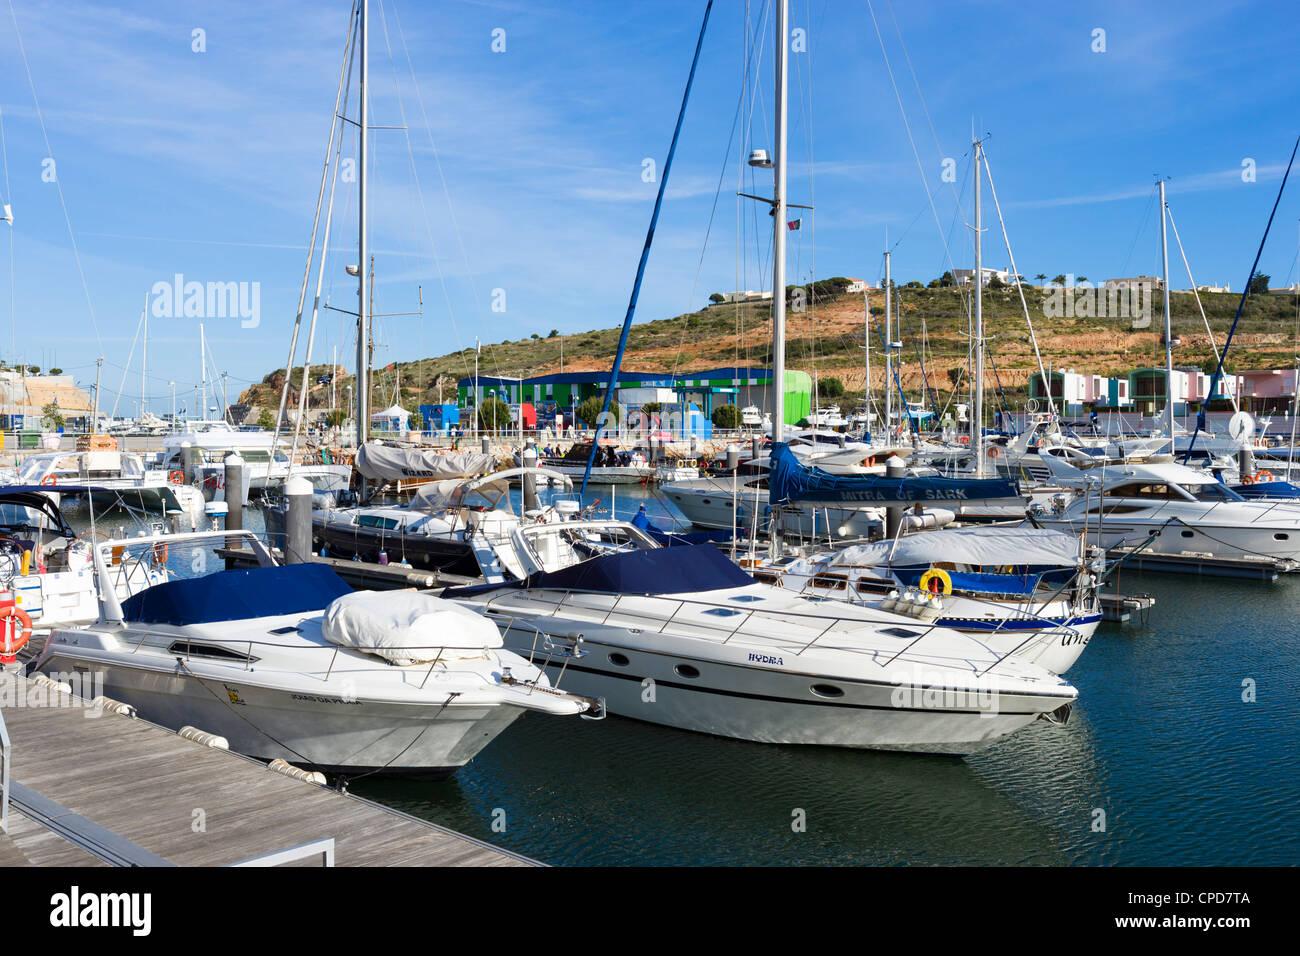 Boats in the Marina, Albufeira, Algarve, Portugal - Stock Image